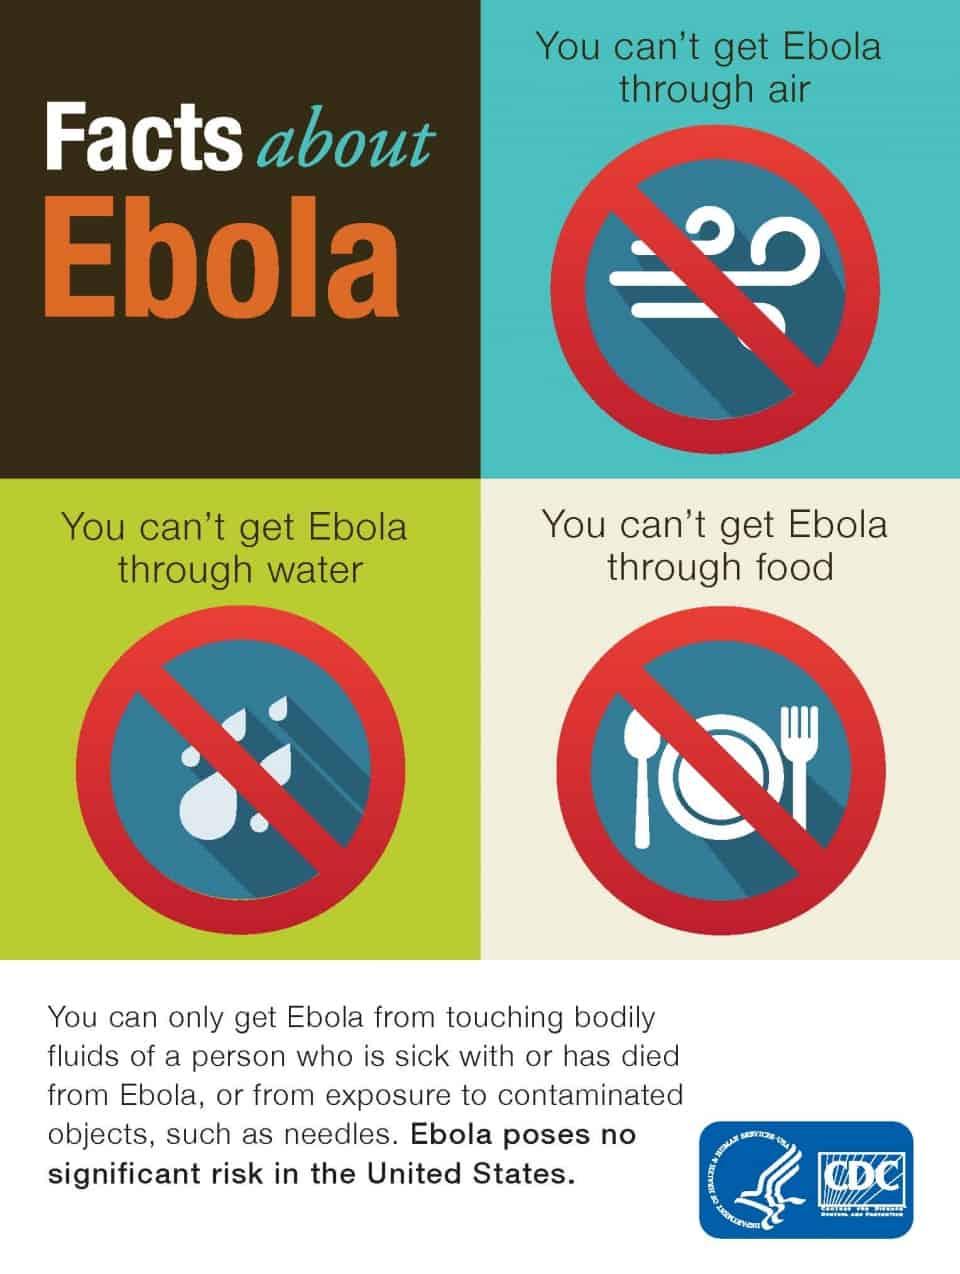 ebola-facts